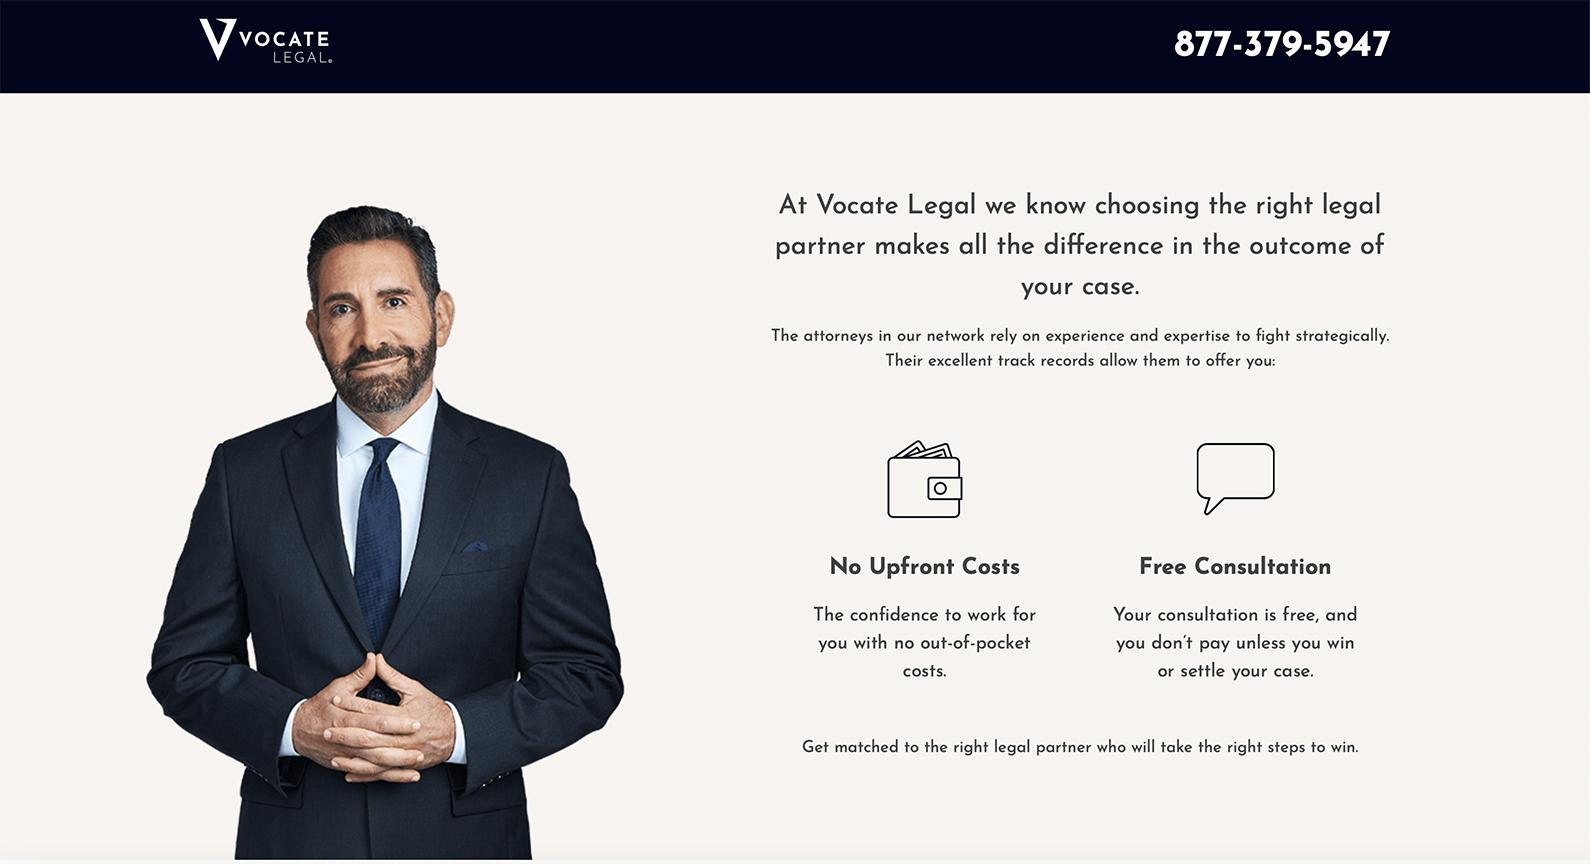 Vocate-Legal-Iamge-1